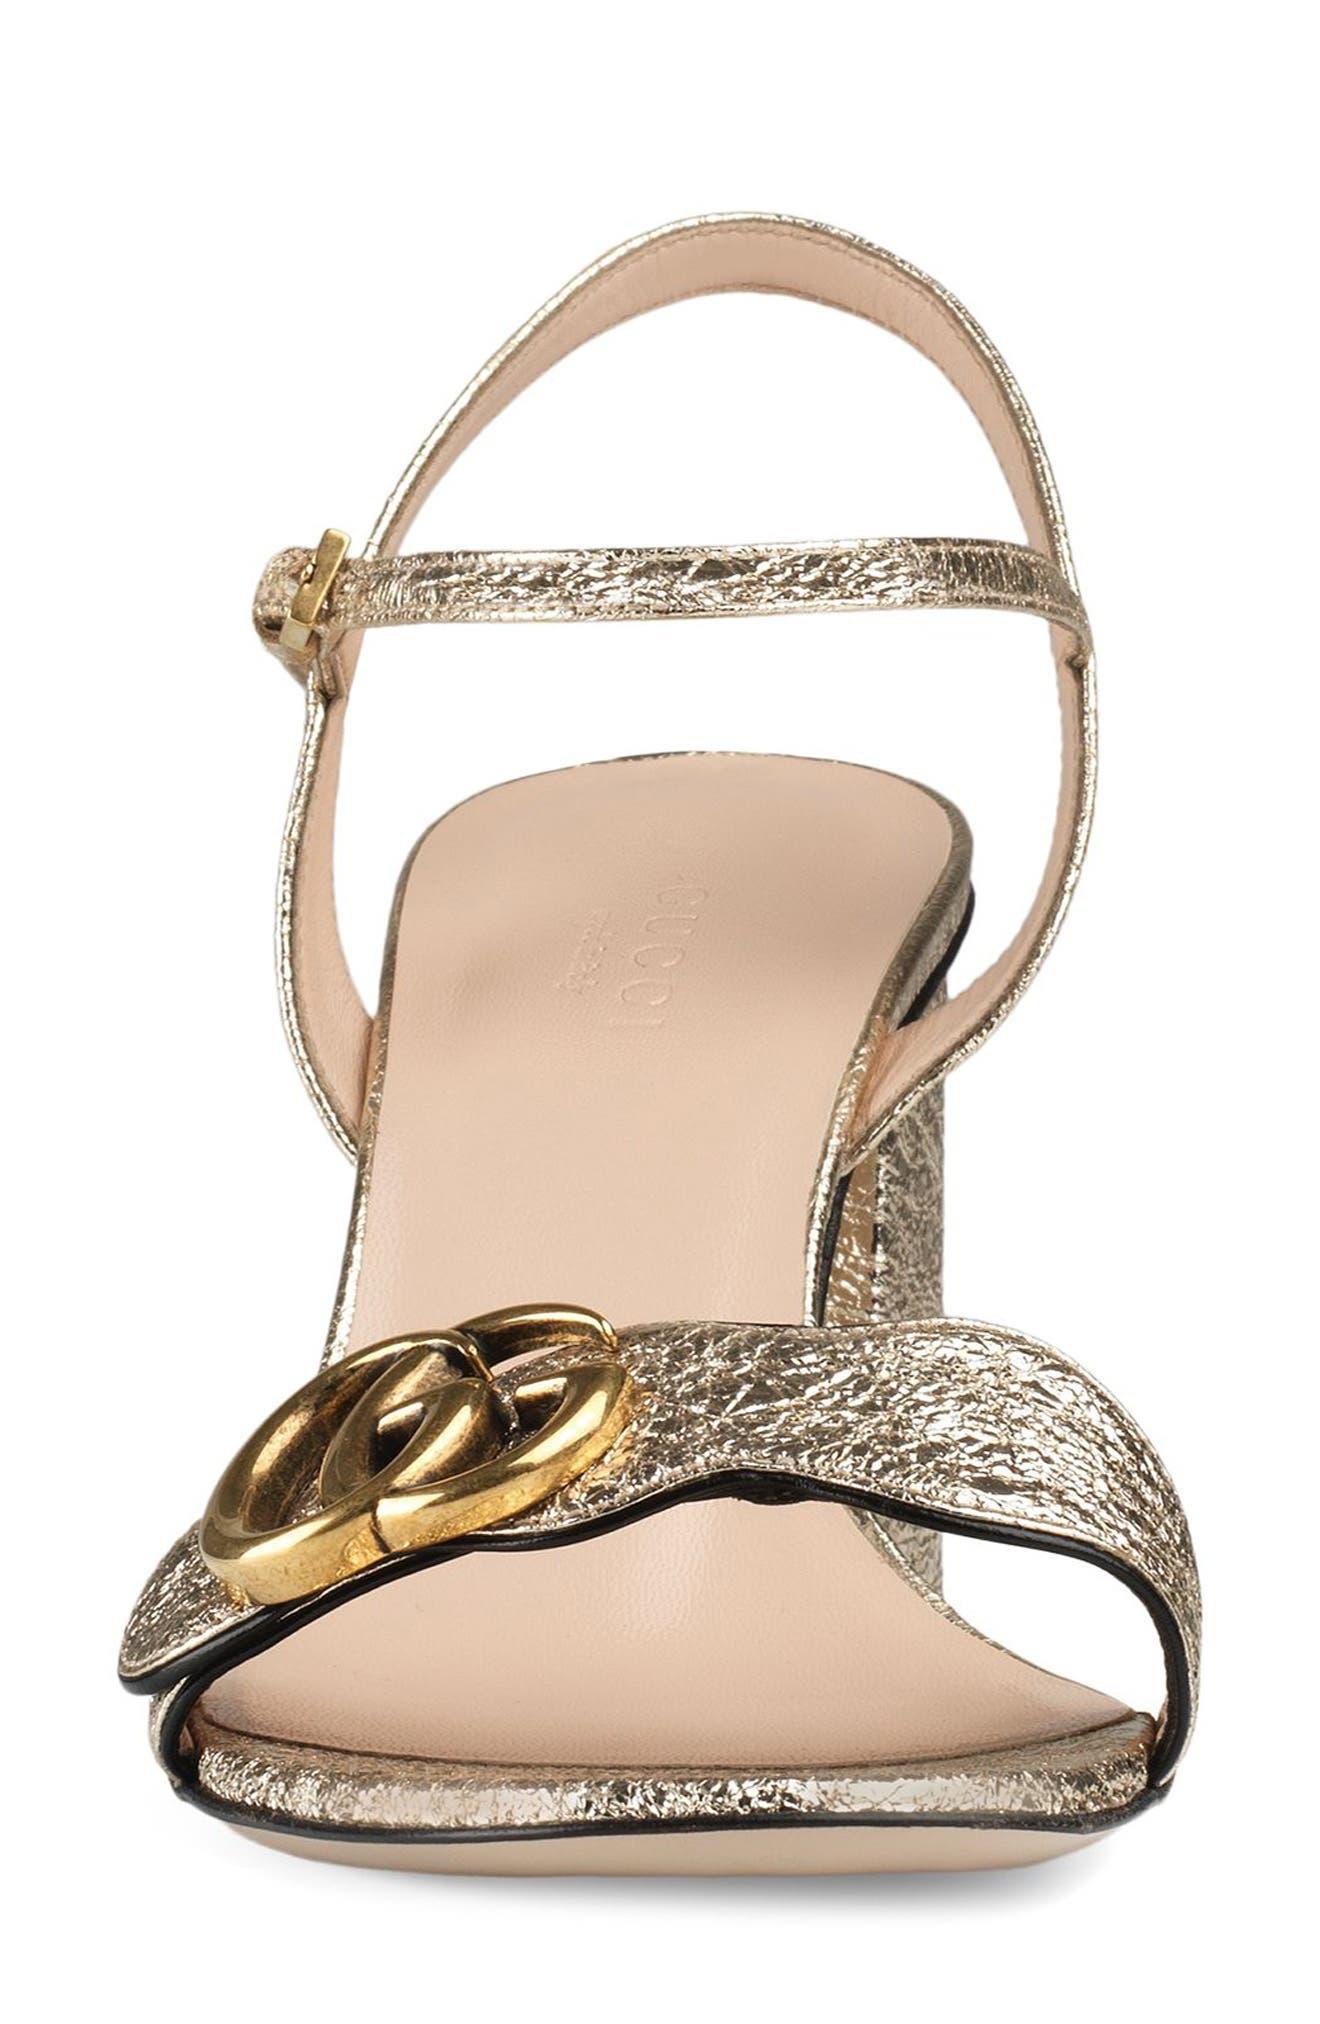 GUCCI, GG Marmont Sandal, Alternate thumbnail 4, color, METALLIC GOLD